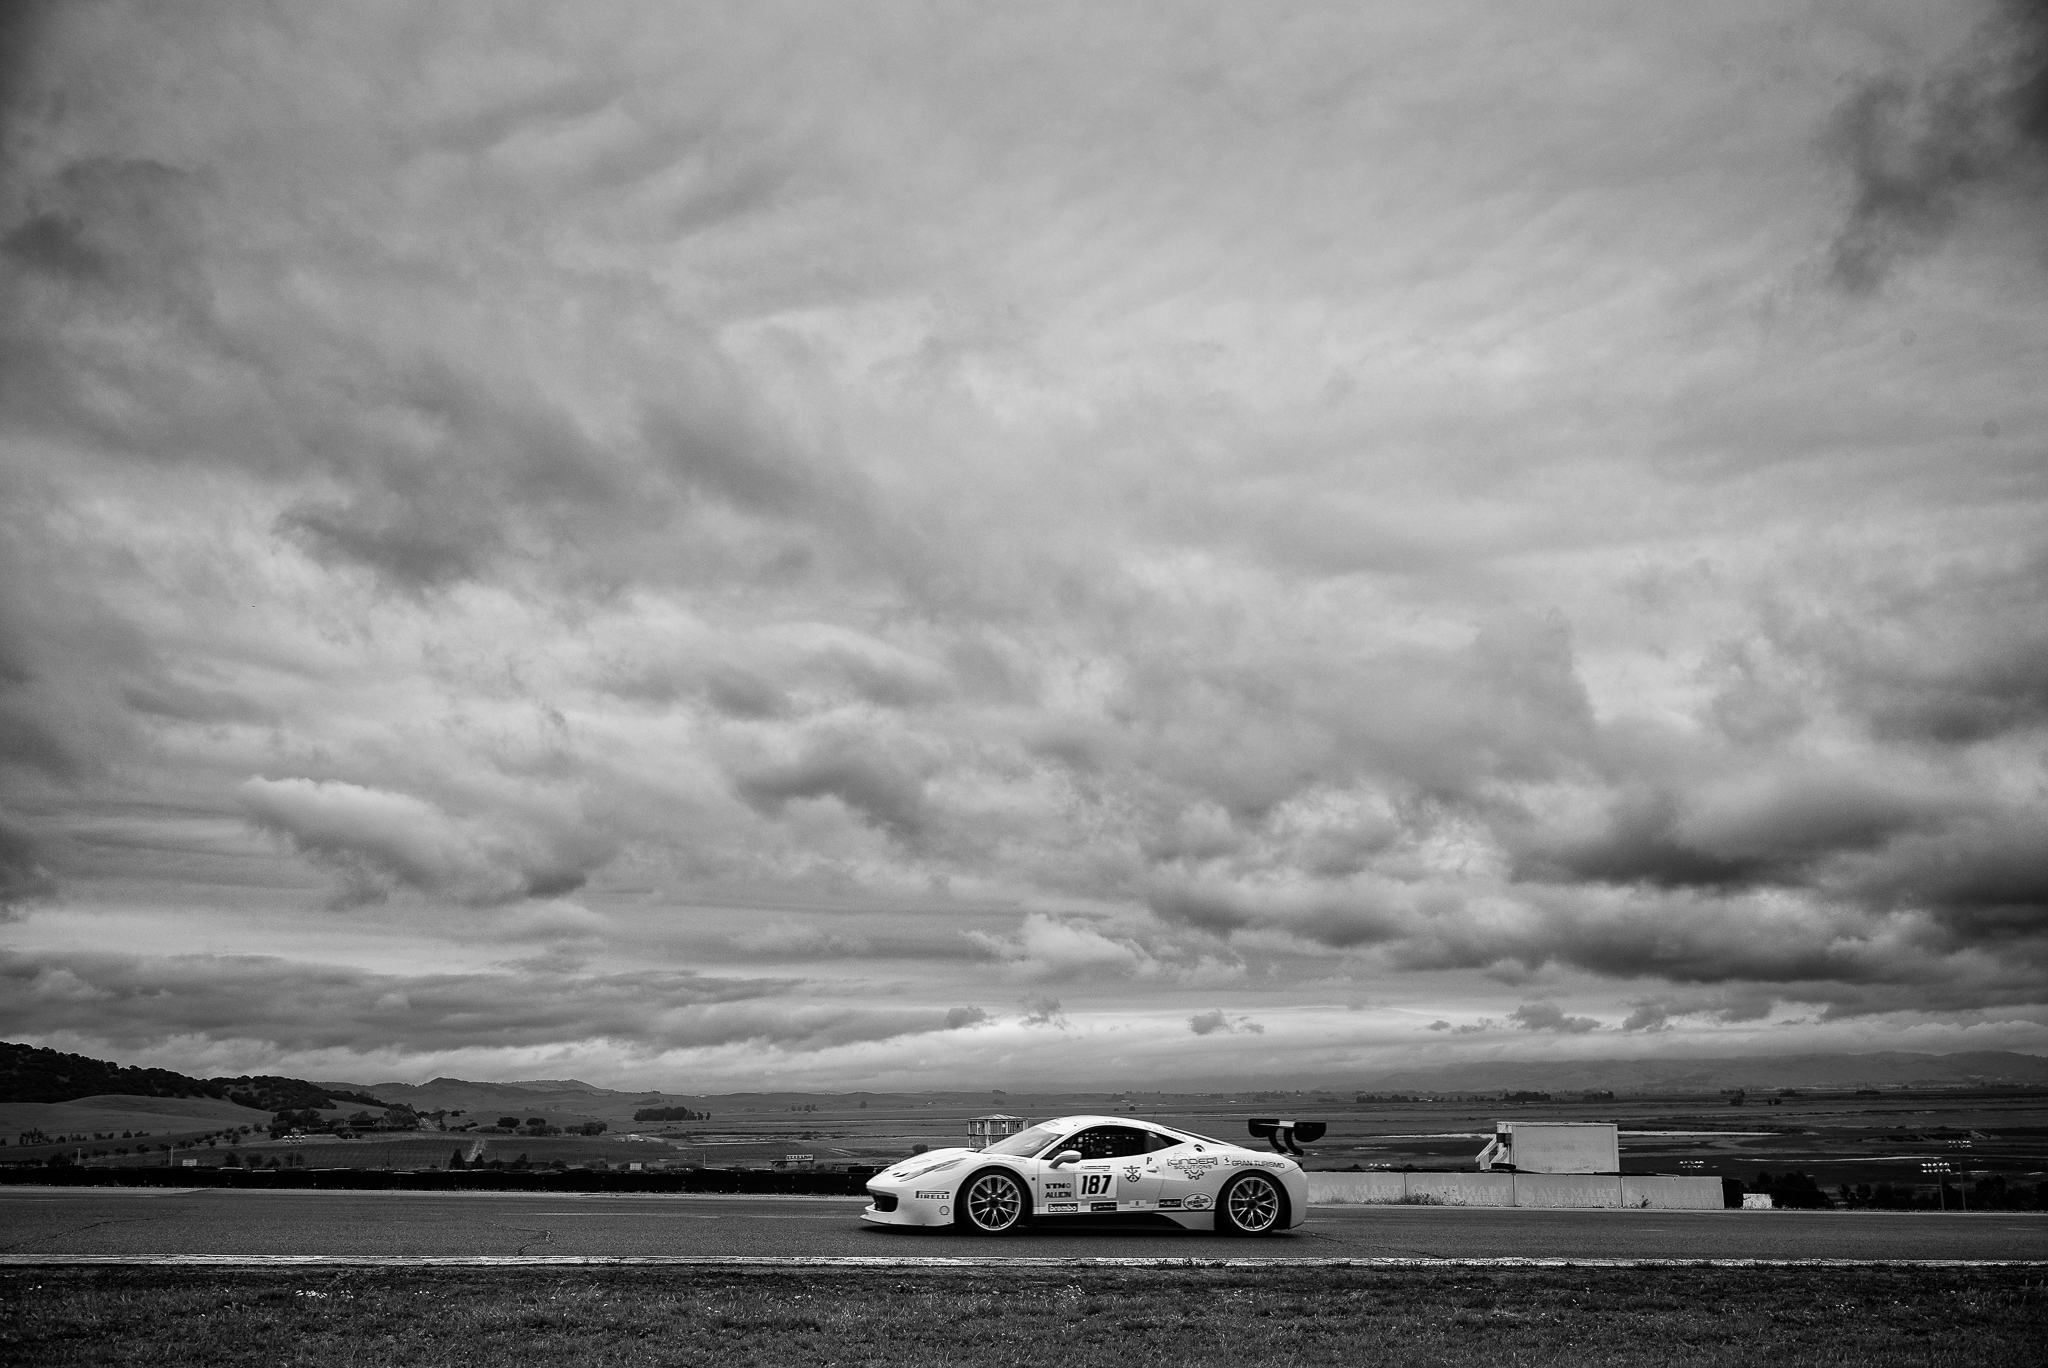 20160410 Ferrari Challenge day 3-Sonoma Raceway-1001450-Edit-Edit.jpg